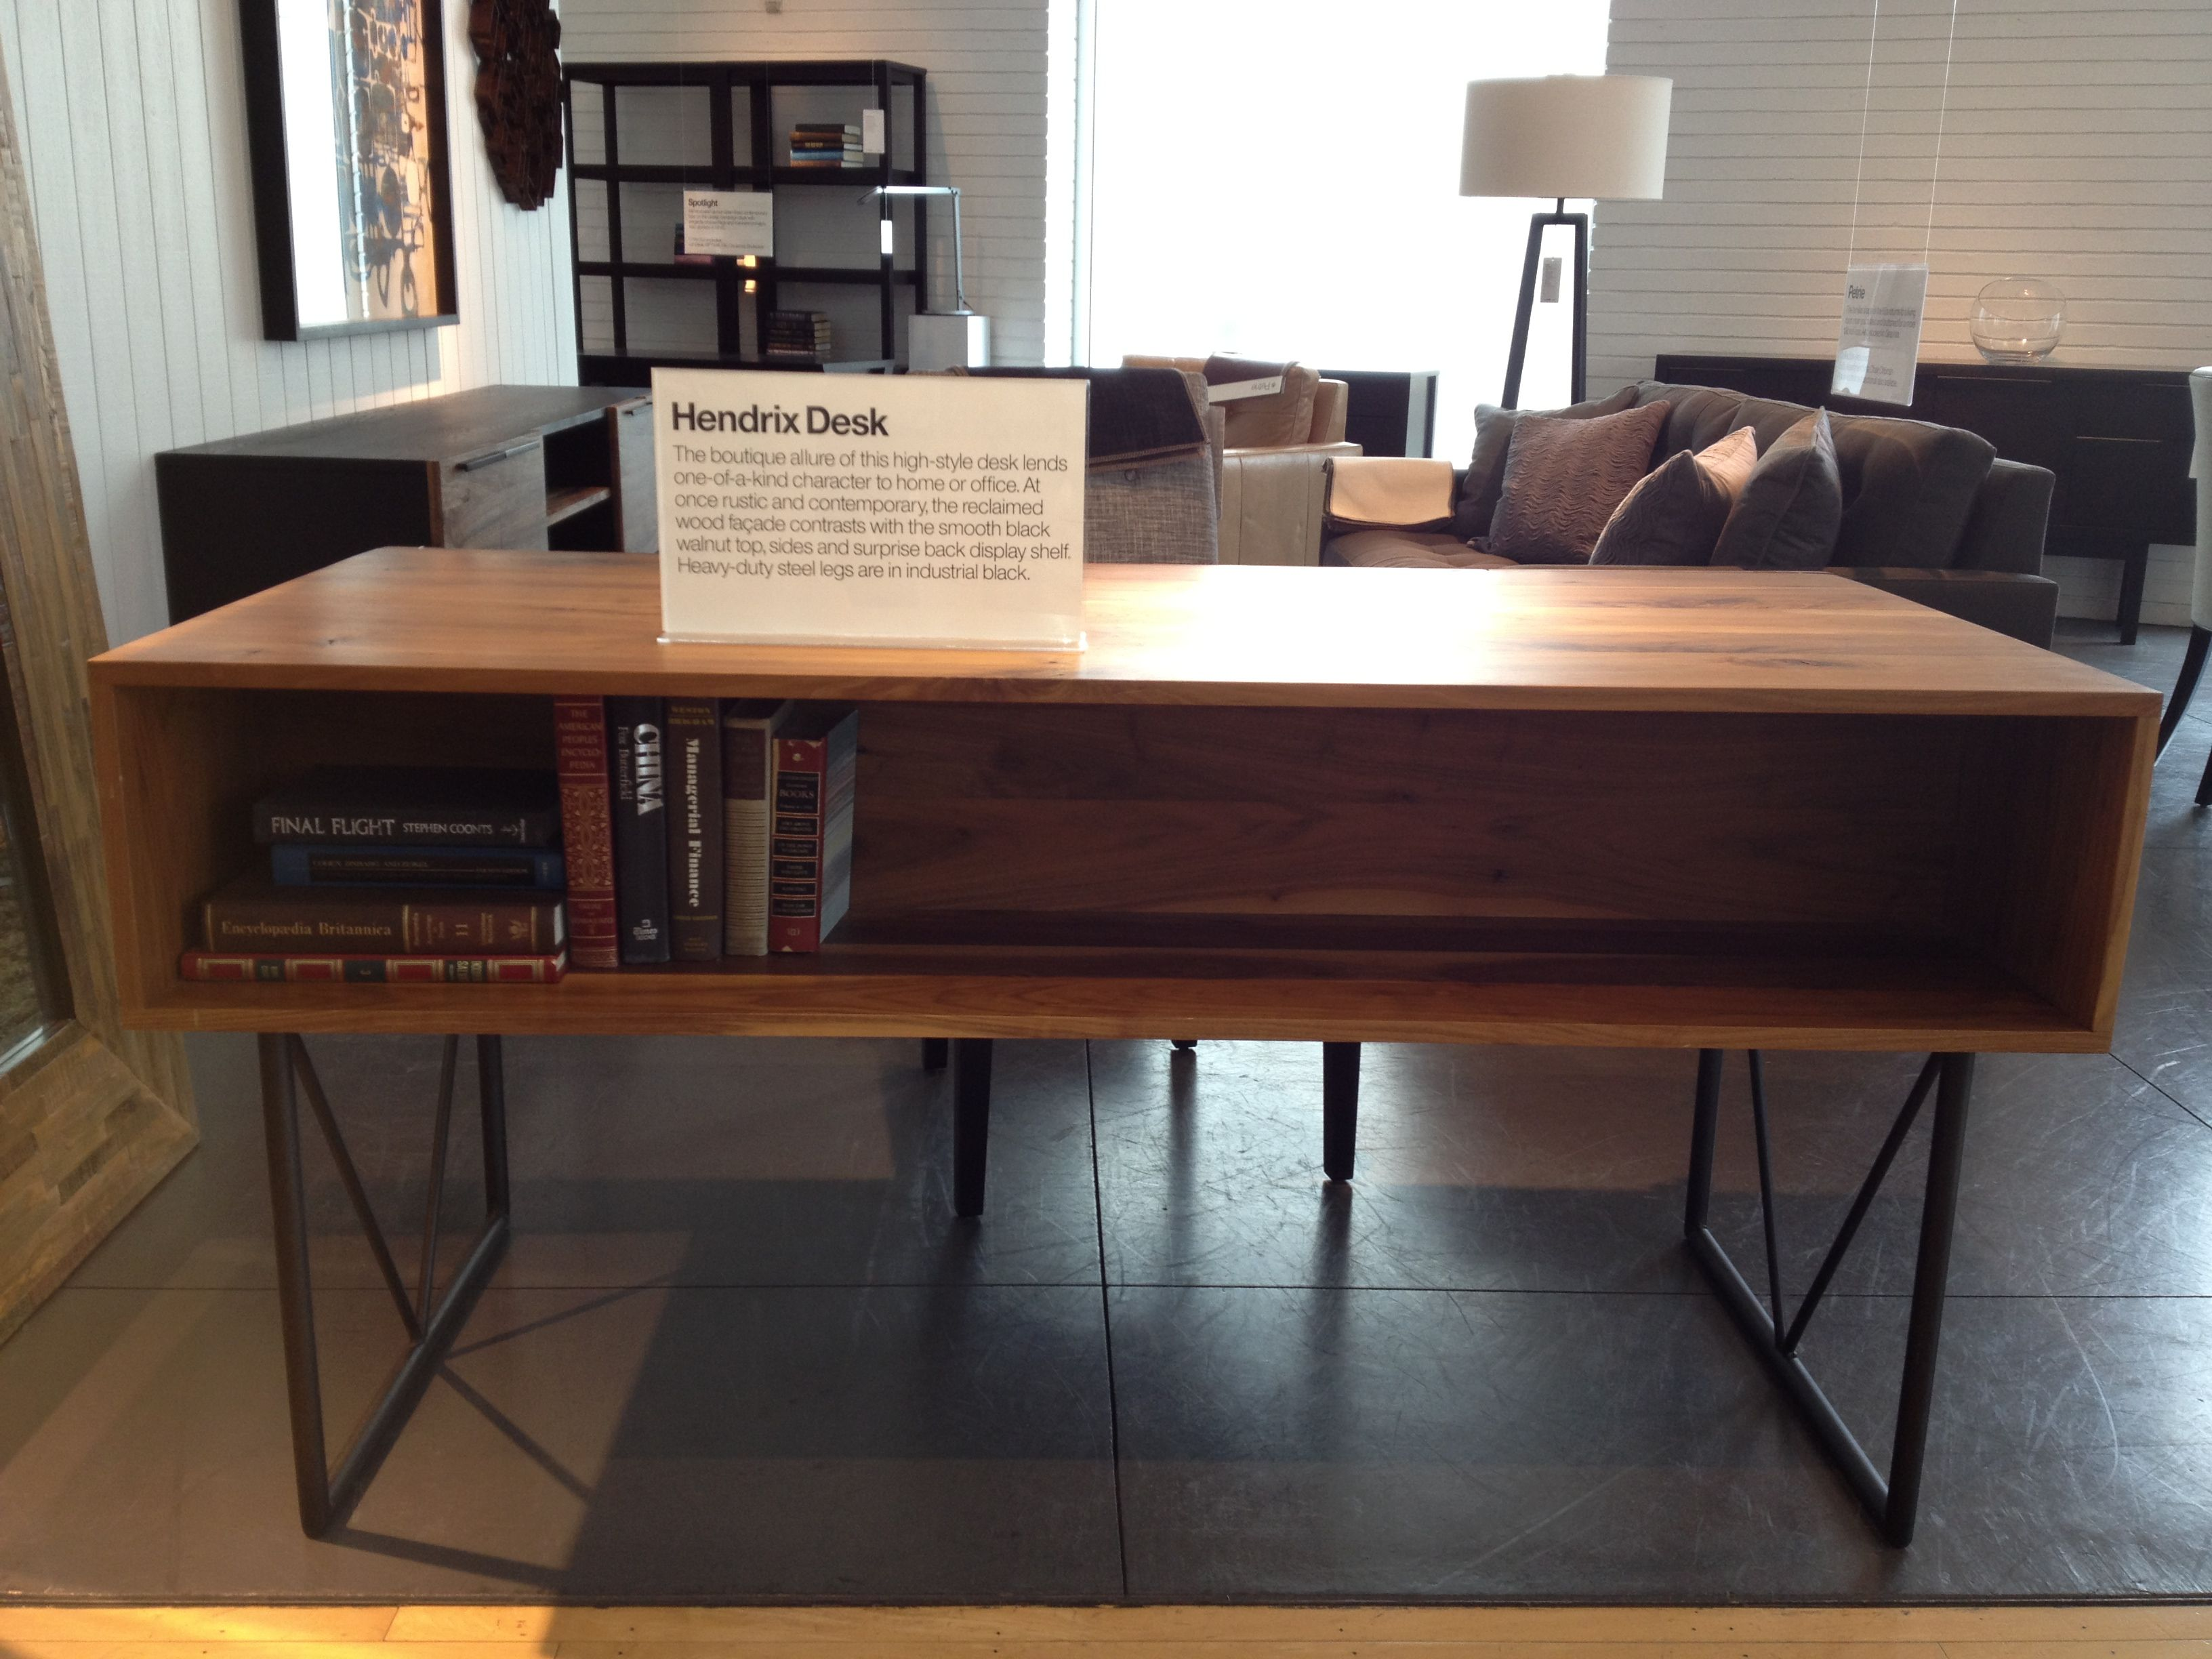 Hendrix Desk Crate & Barrel For the Home Pinterest